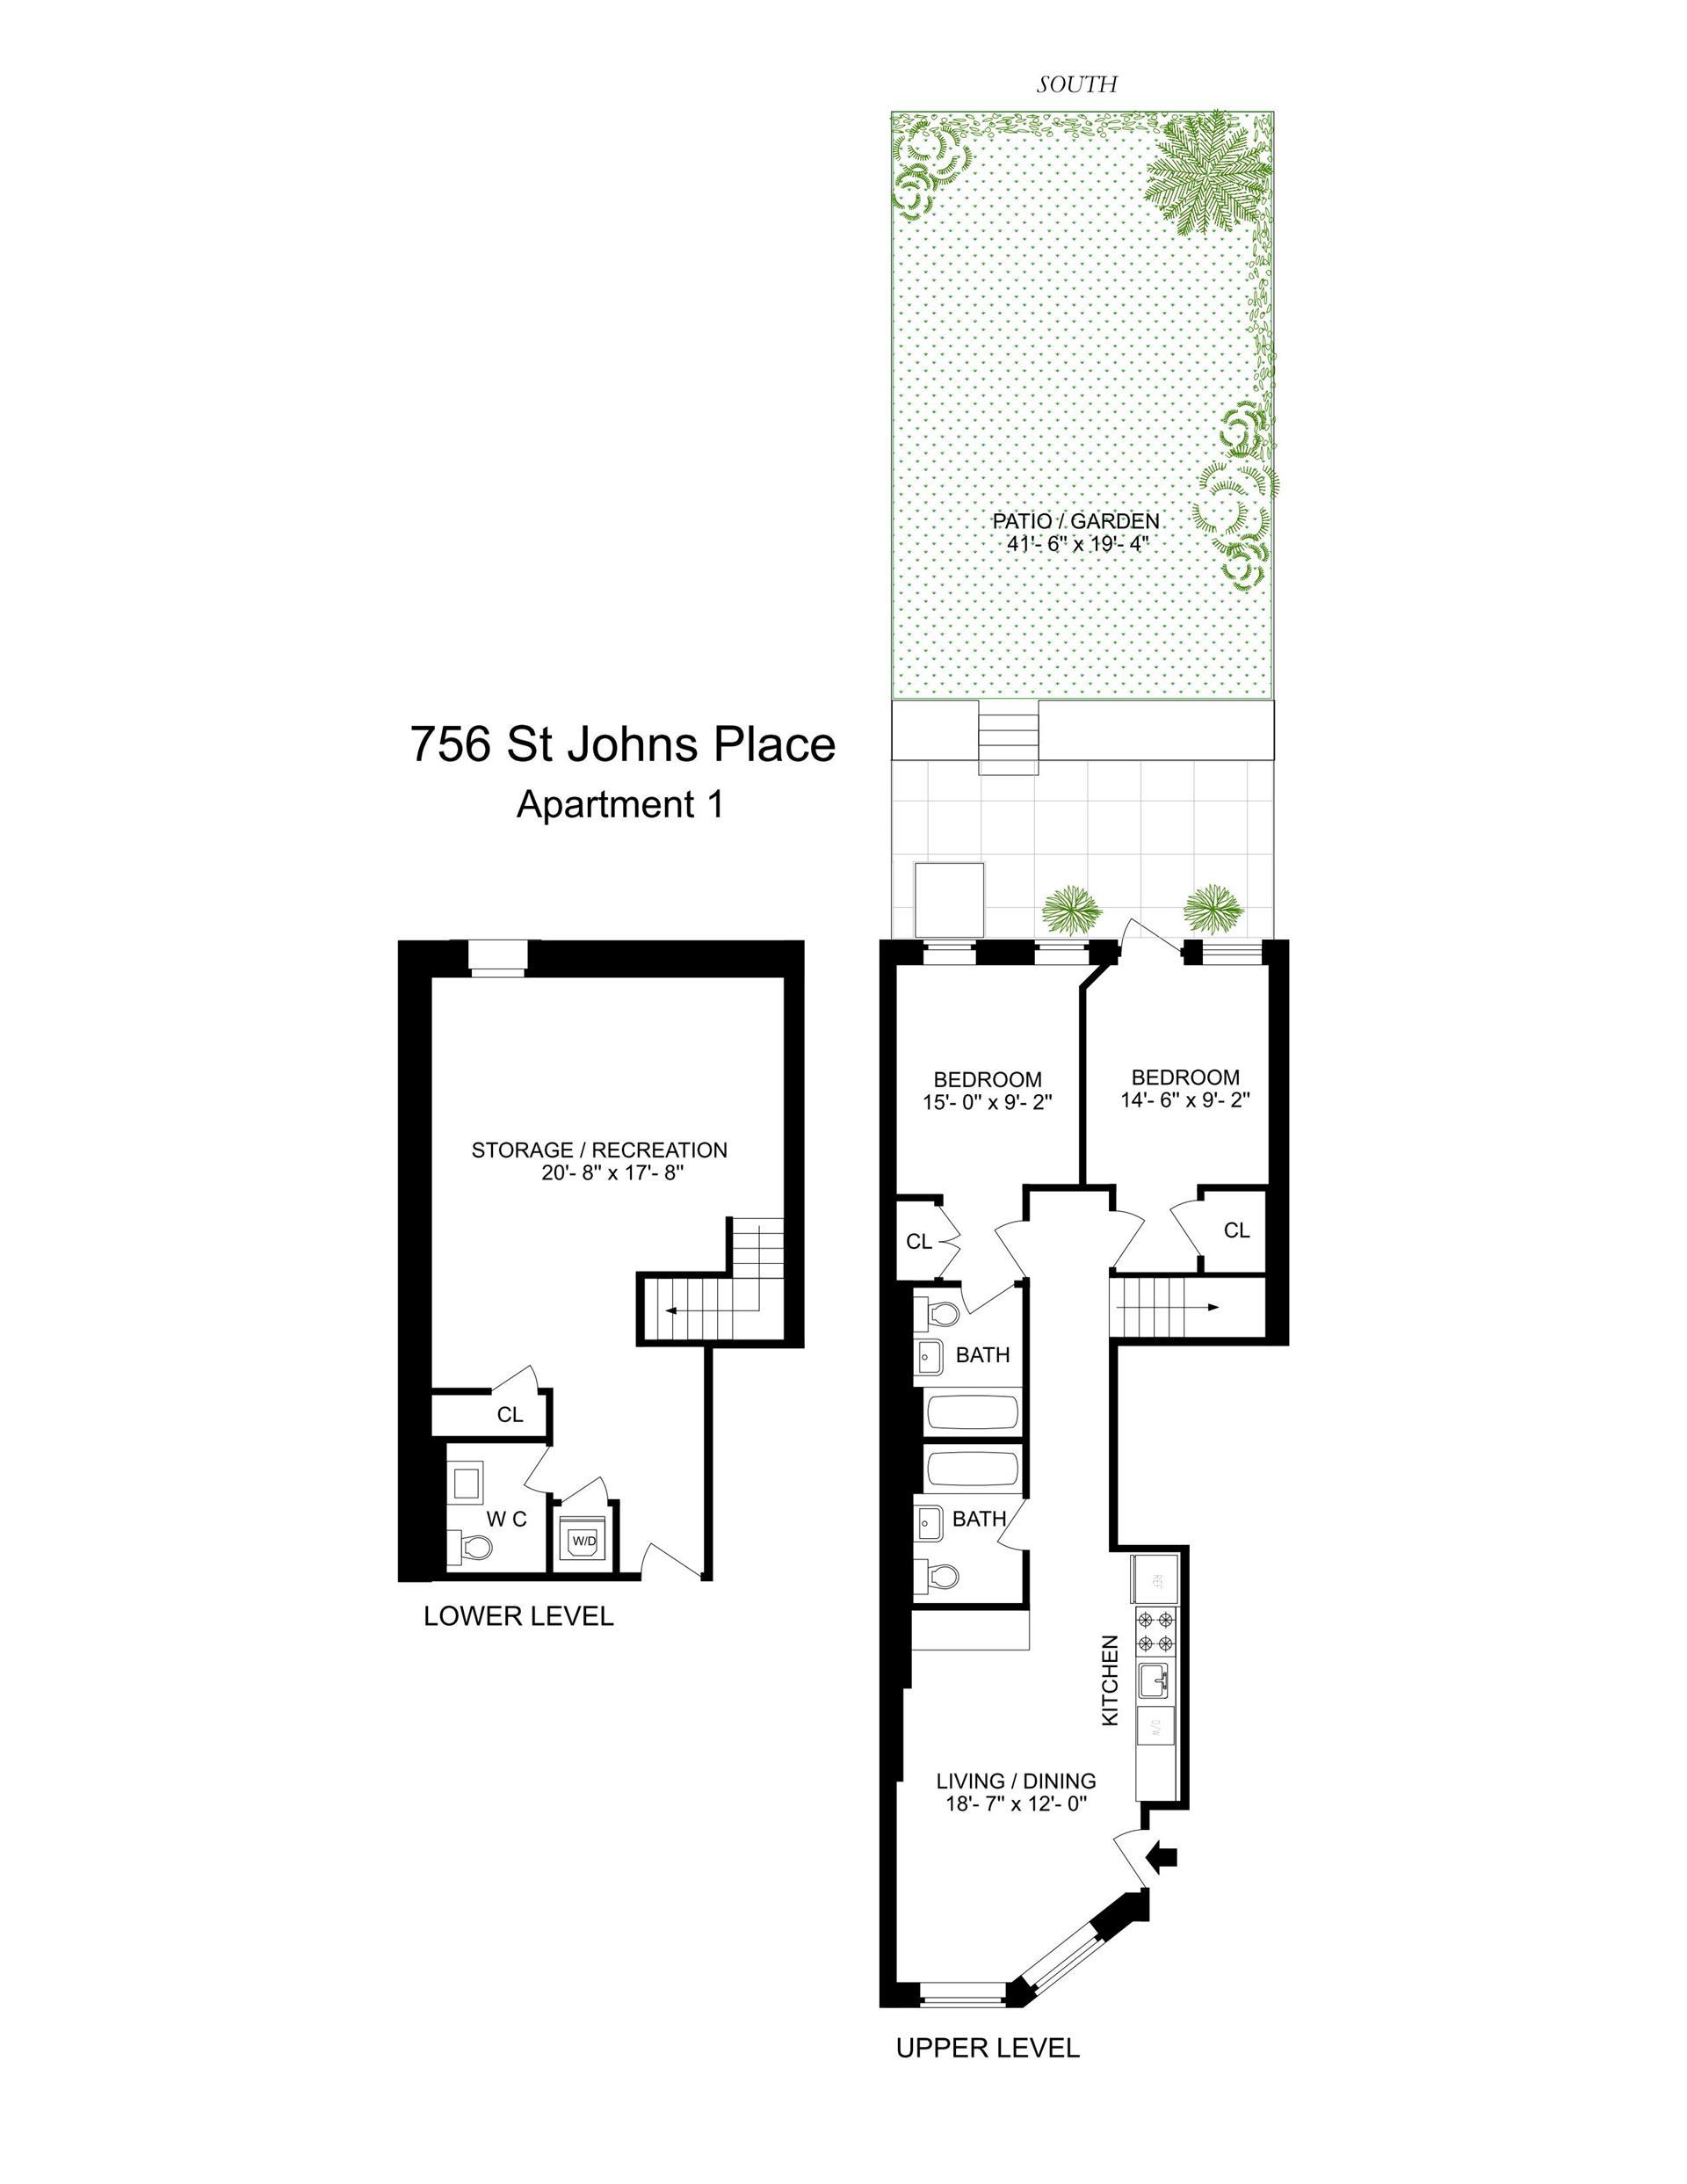 Floor plan of 756 St Johns Pl, 1 - Crown Heights, New York